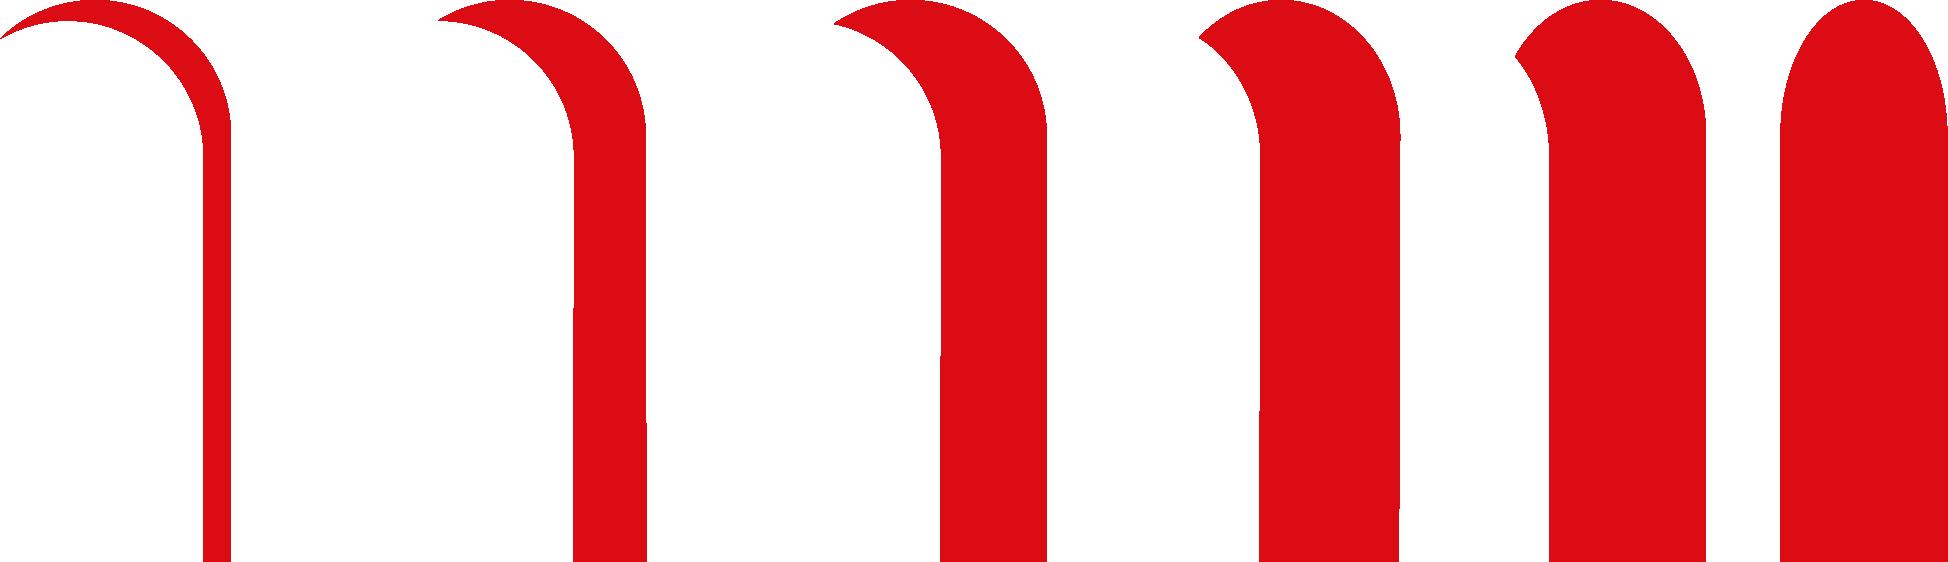 Logo Decomarbre 94